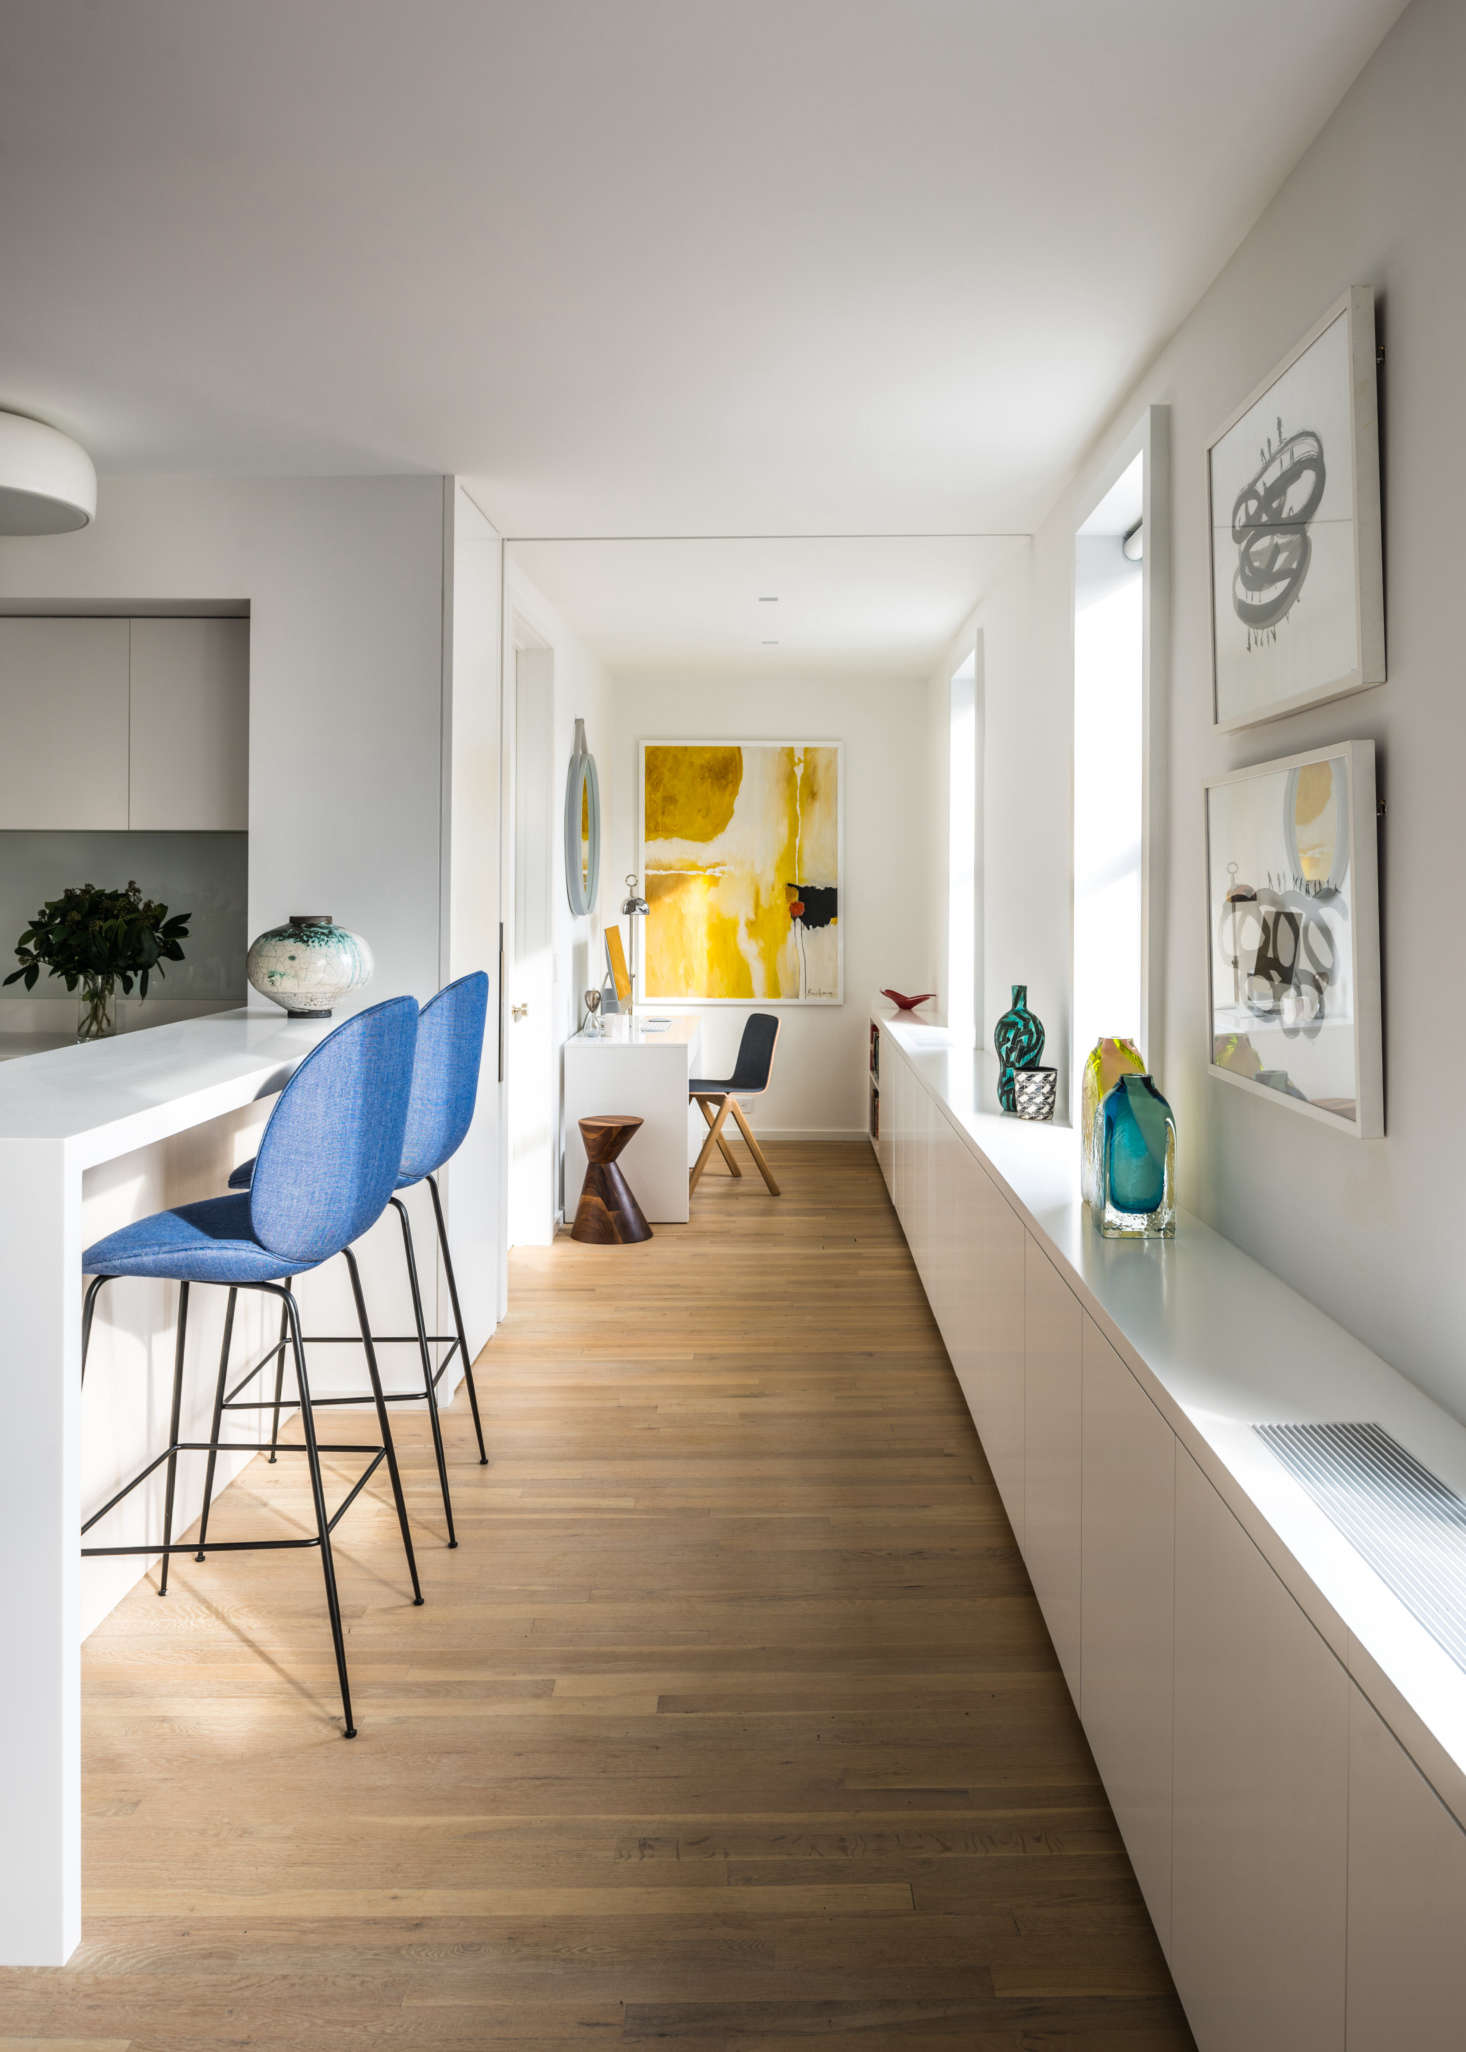 Internal Affairs Interior Designers: Michael K Chen Architecture